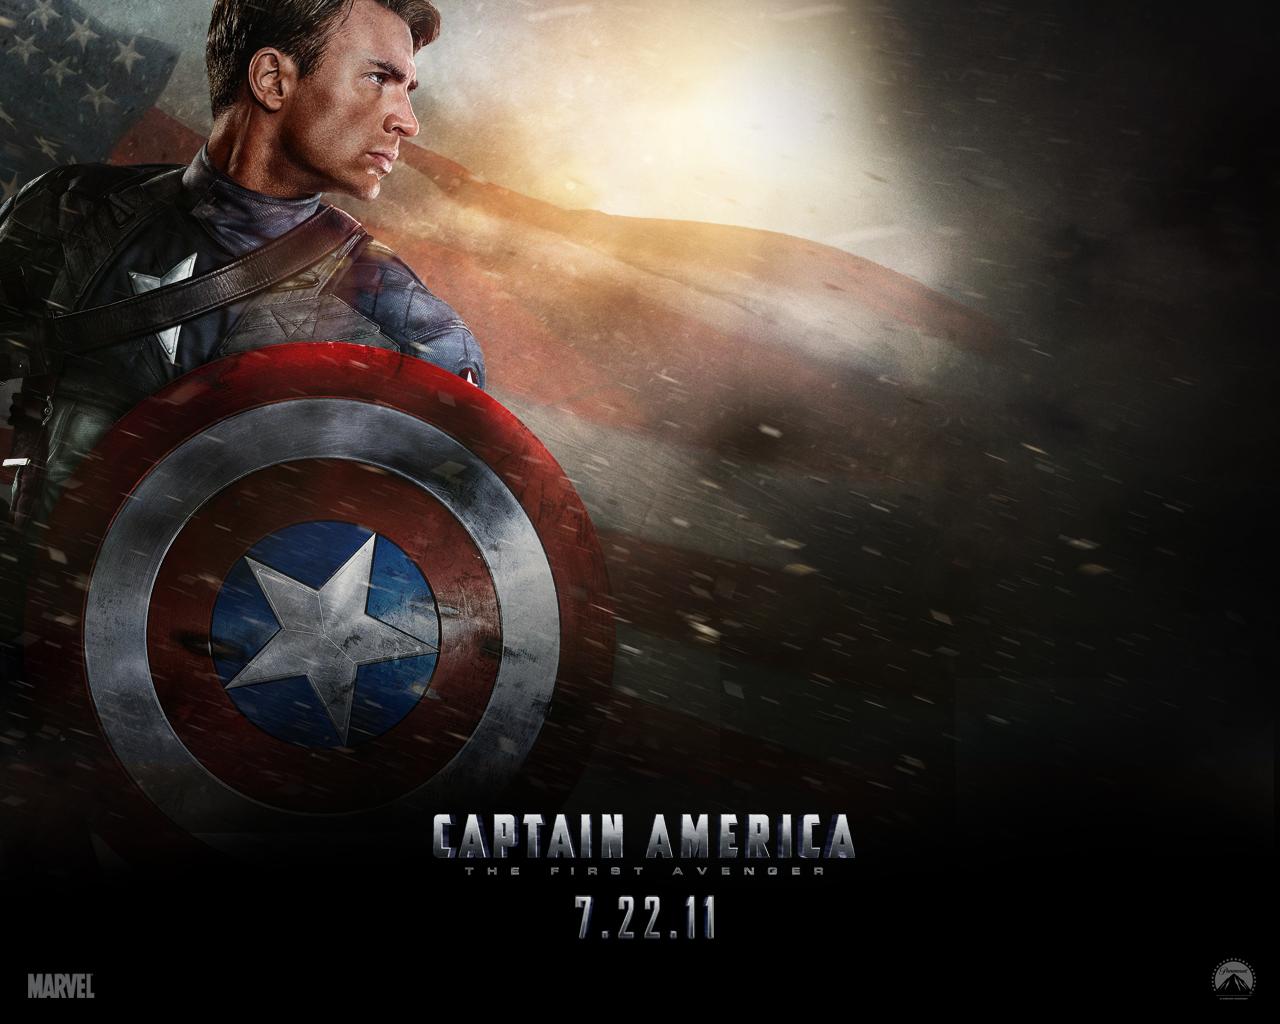 Bilder von Captain America – The First Avenger Film